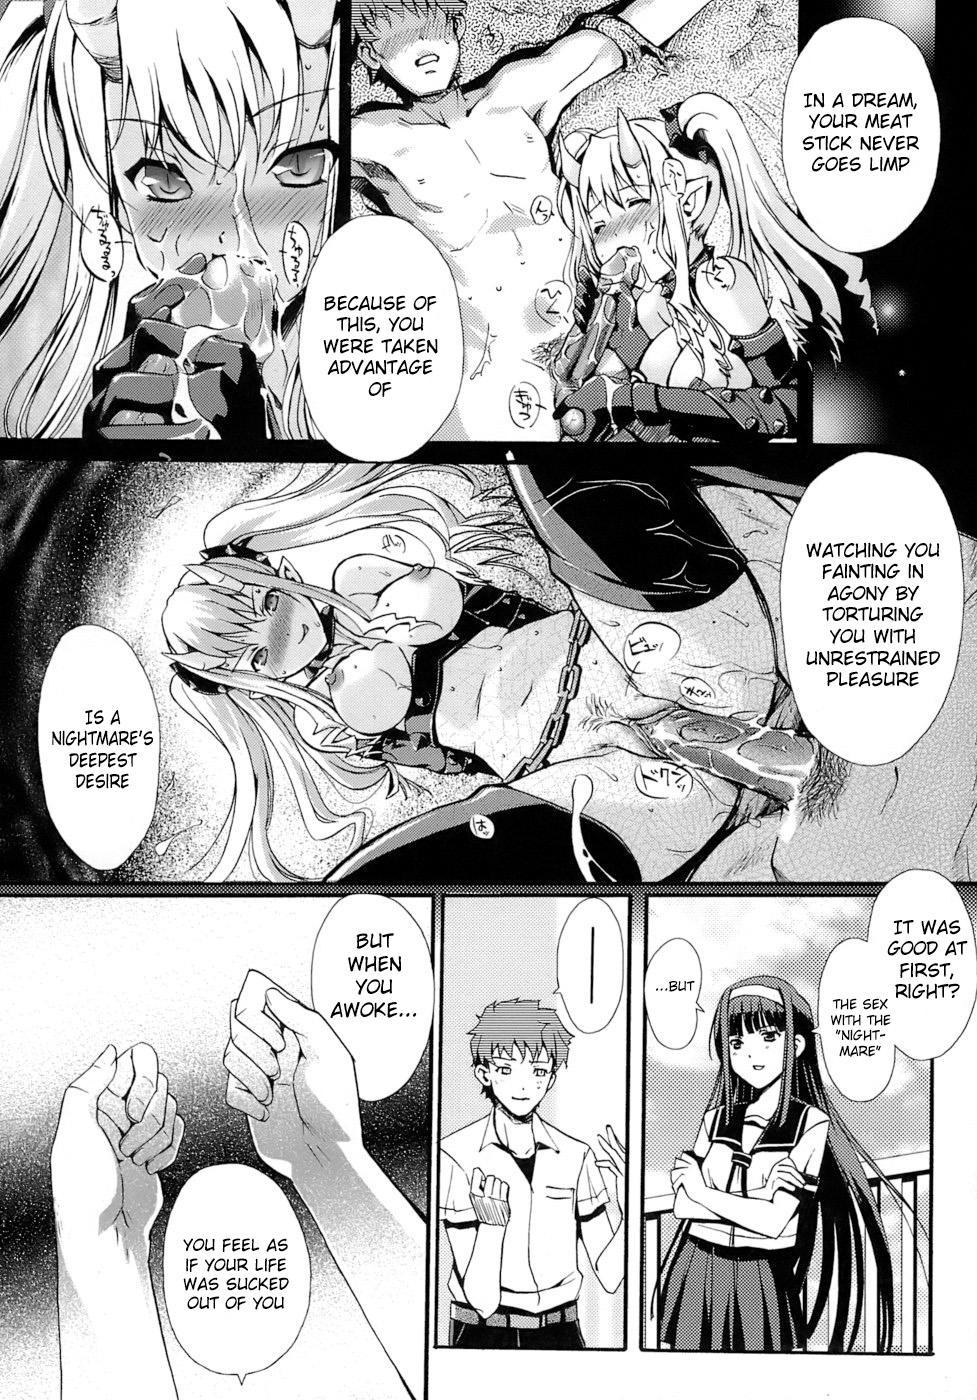 Otome no Renai Jouji - The Maiden's Love Love Affair 116